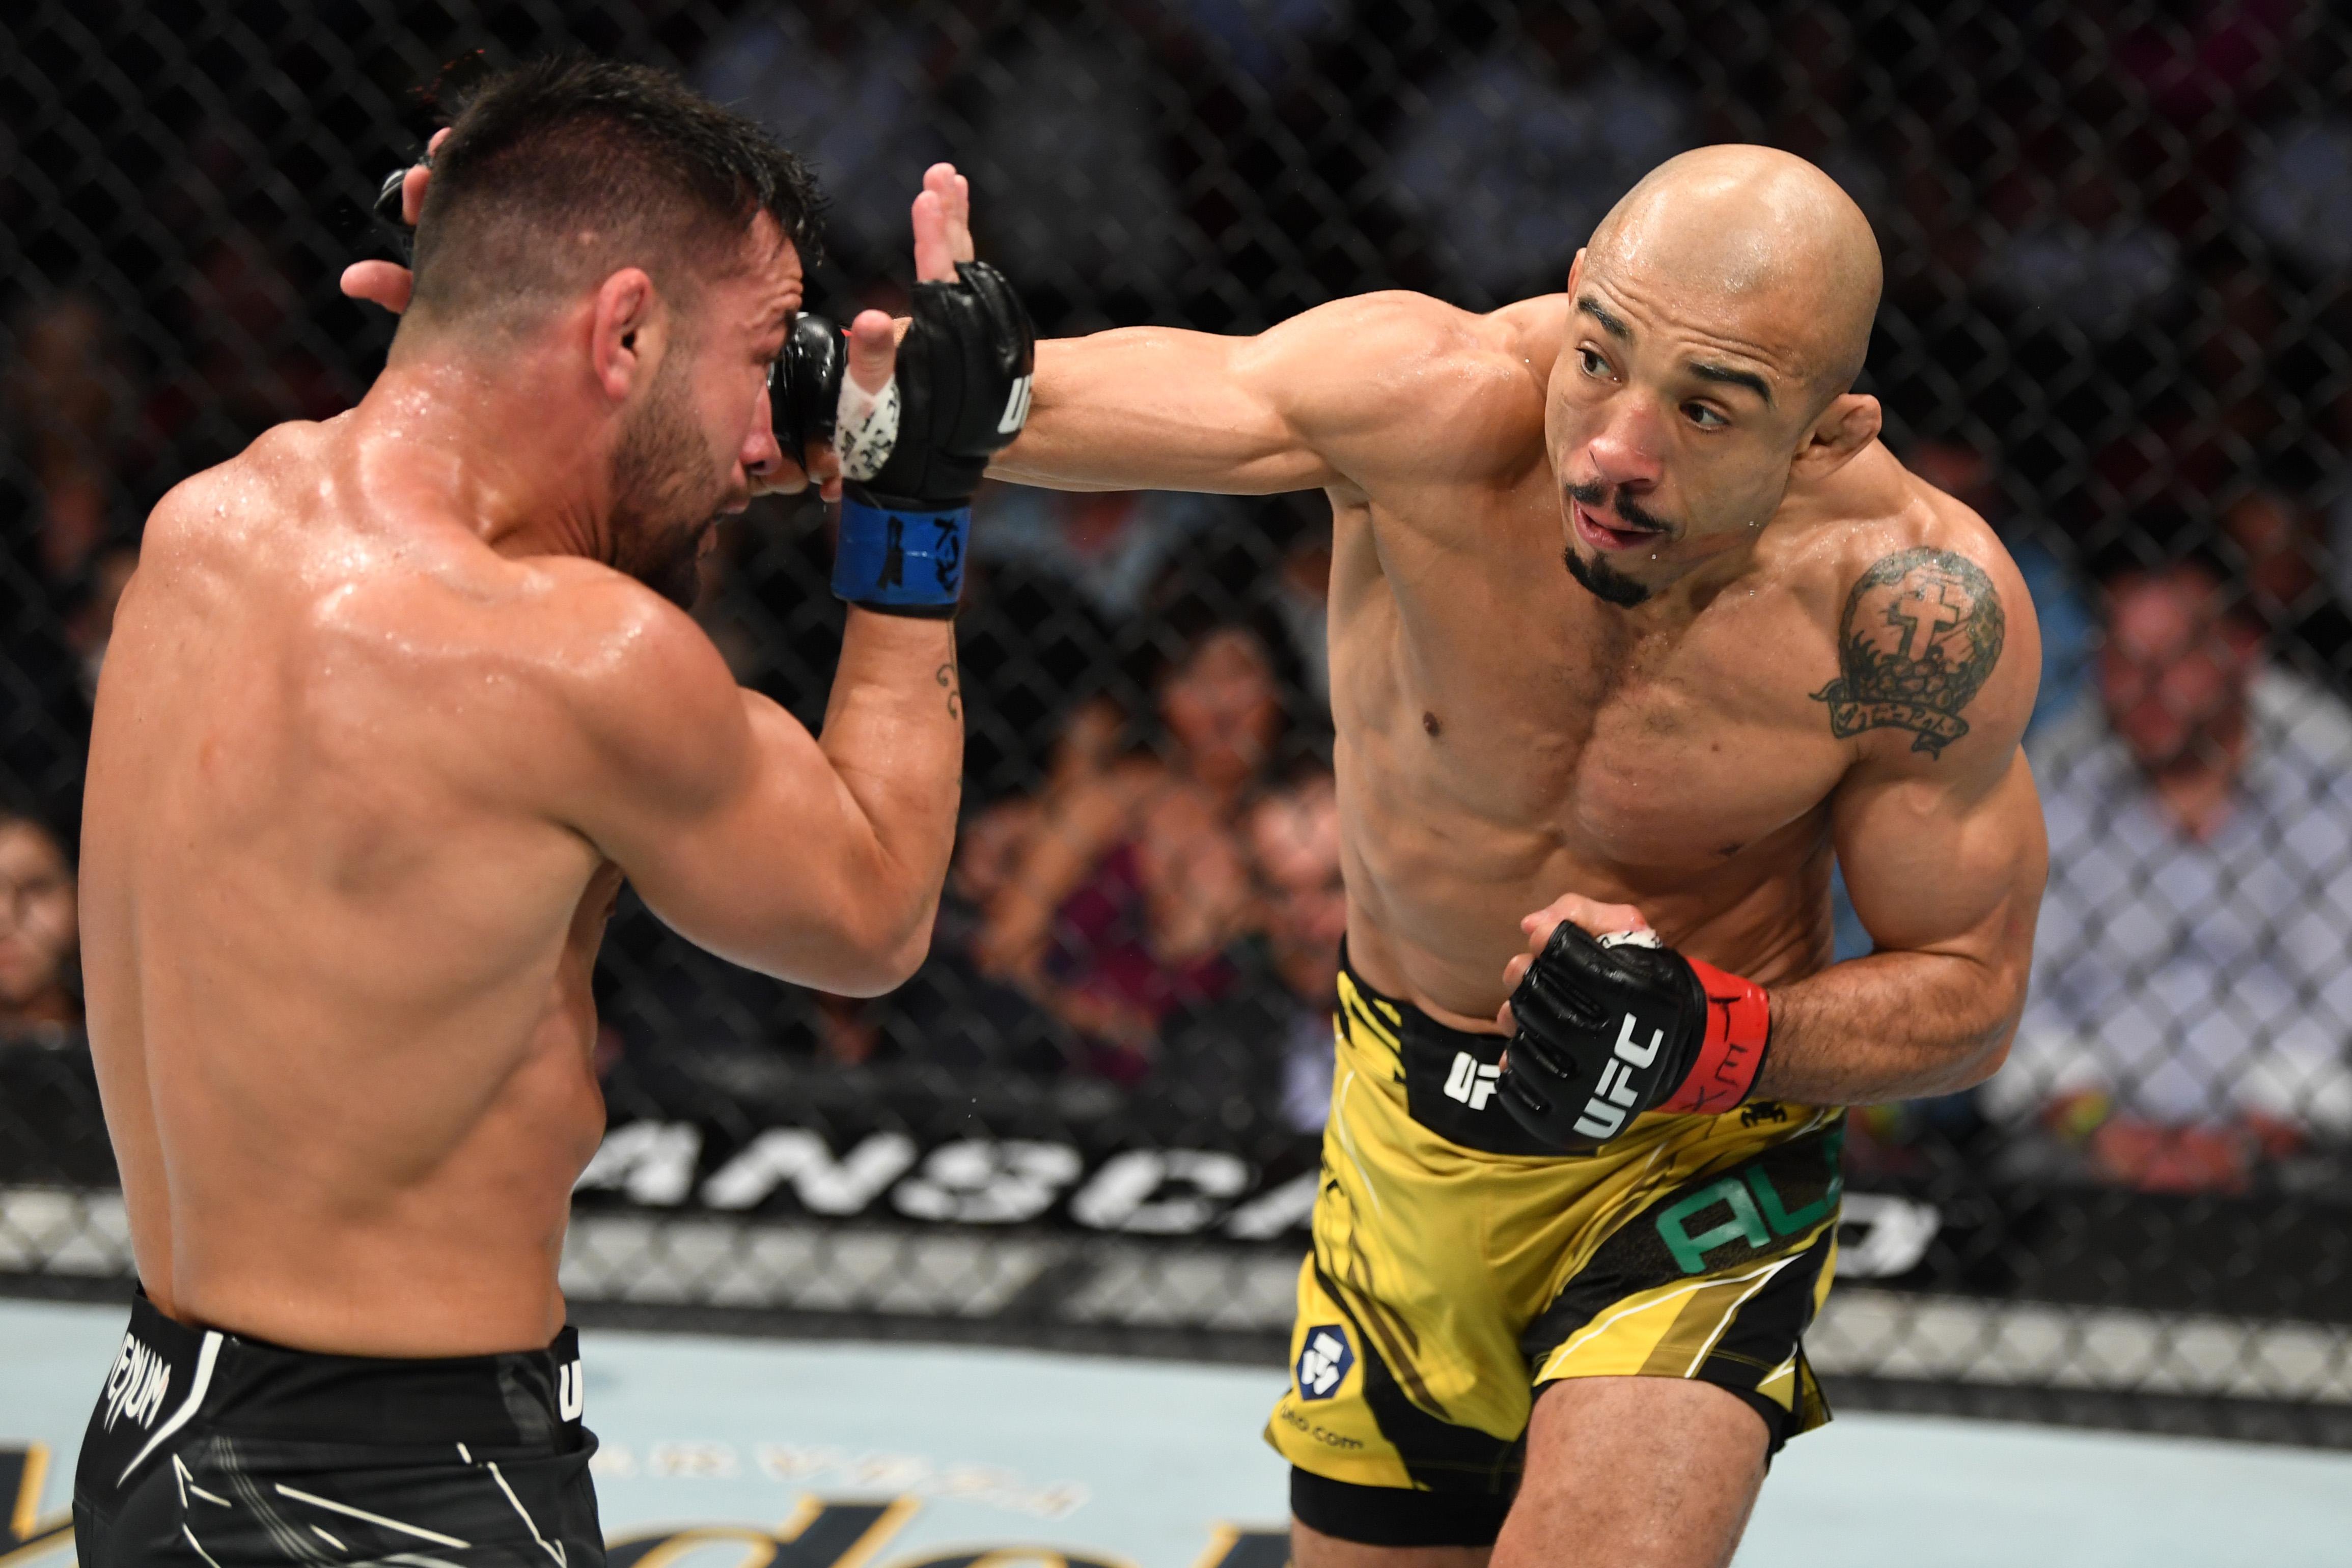 Jose Aldo got the best of Pedro Munhoz in the UFC 265 co-main event